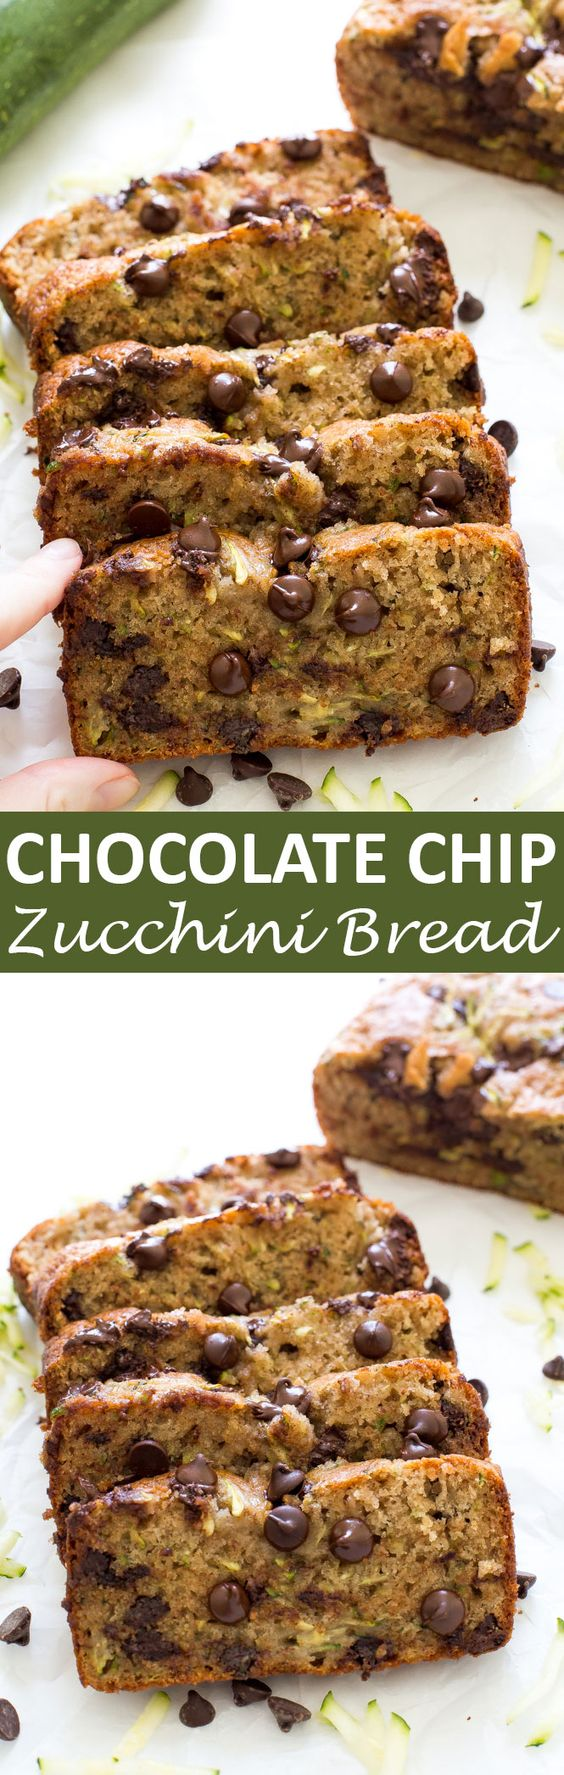 Chocolate Chip Zucchini Bread | Recipe | Recipe Zucchini and Zucchini